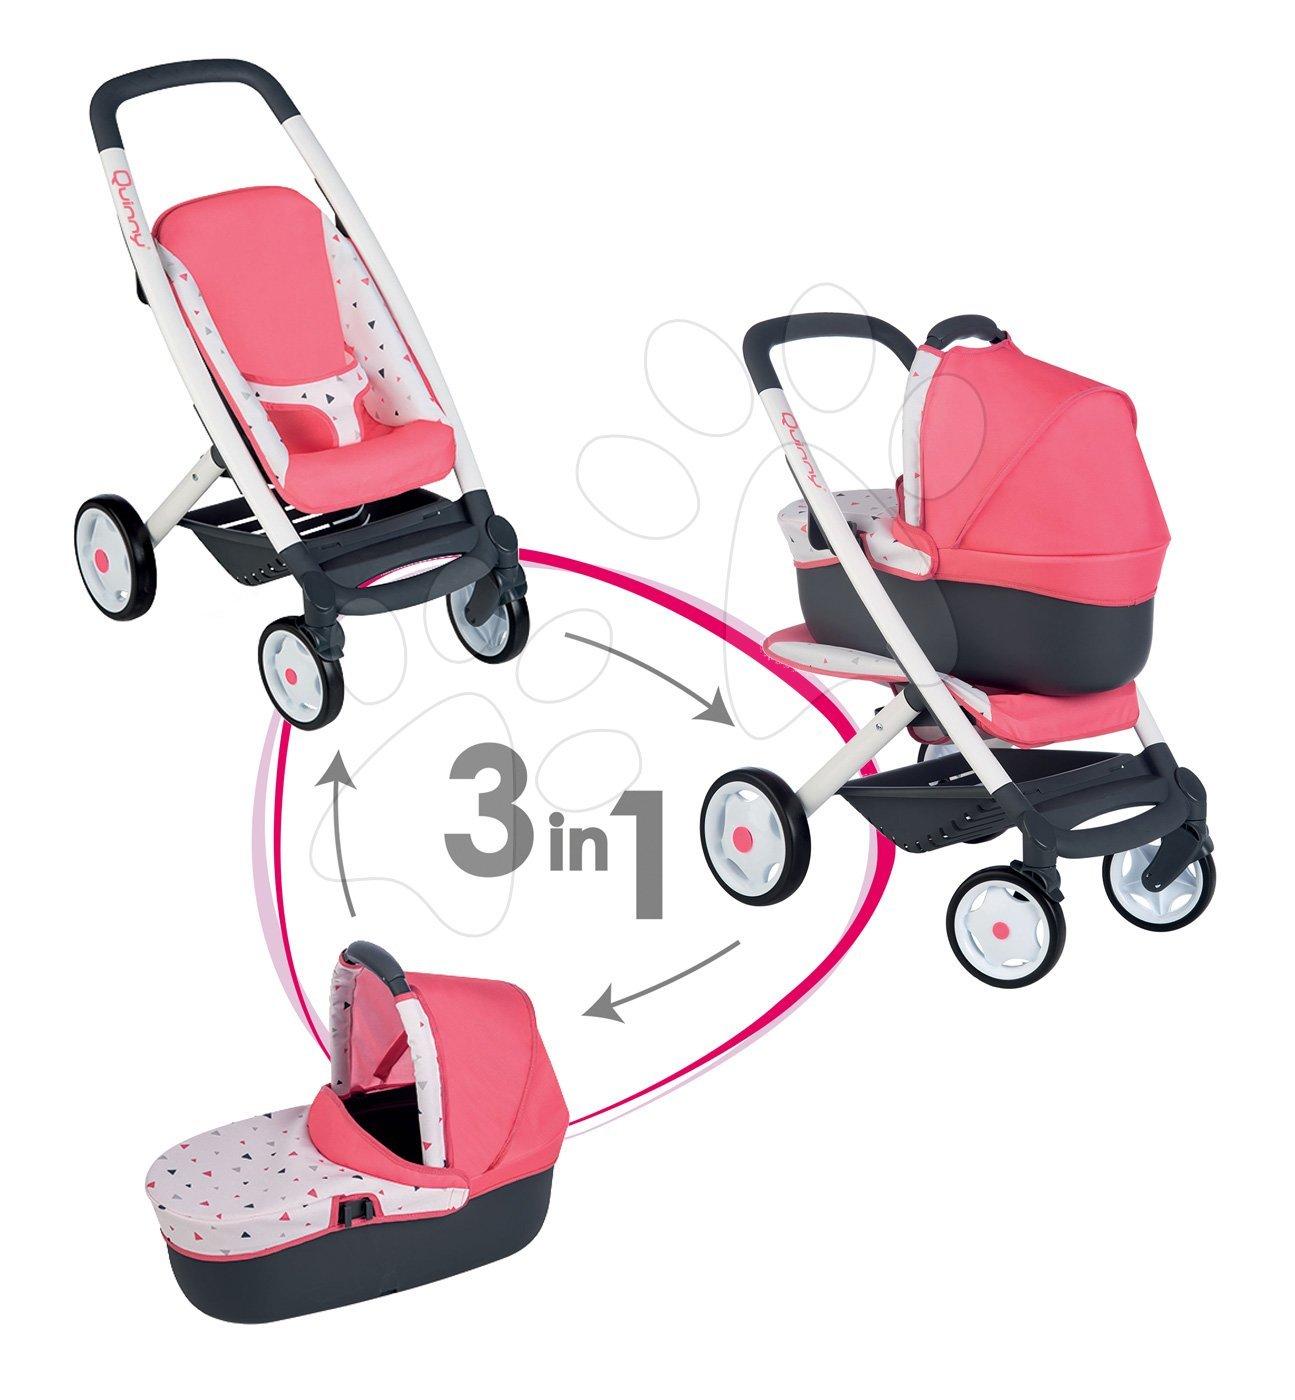 Kočárek Trio Pastel Maxi Cosi & Quinny Smoby hluboký a sportovní 3v1 s nosítkem pro panenku růžový